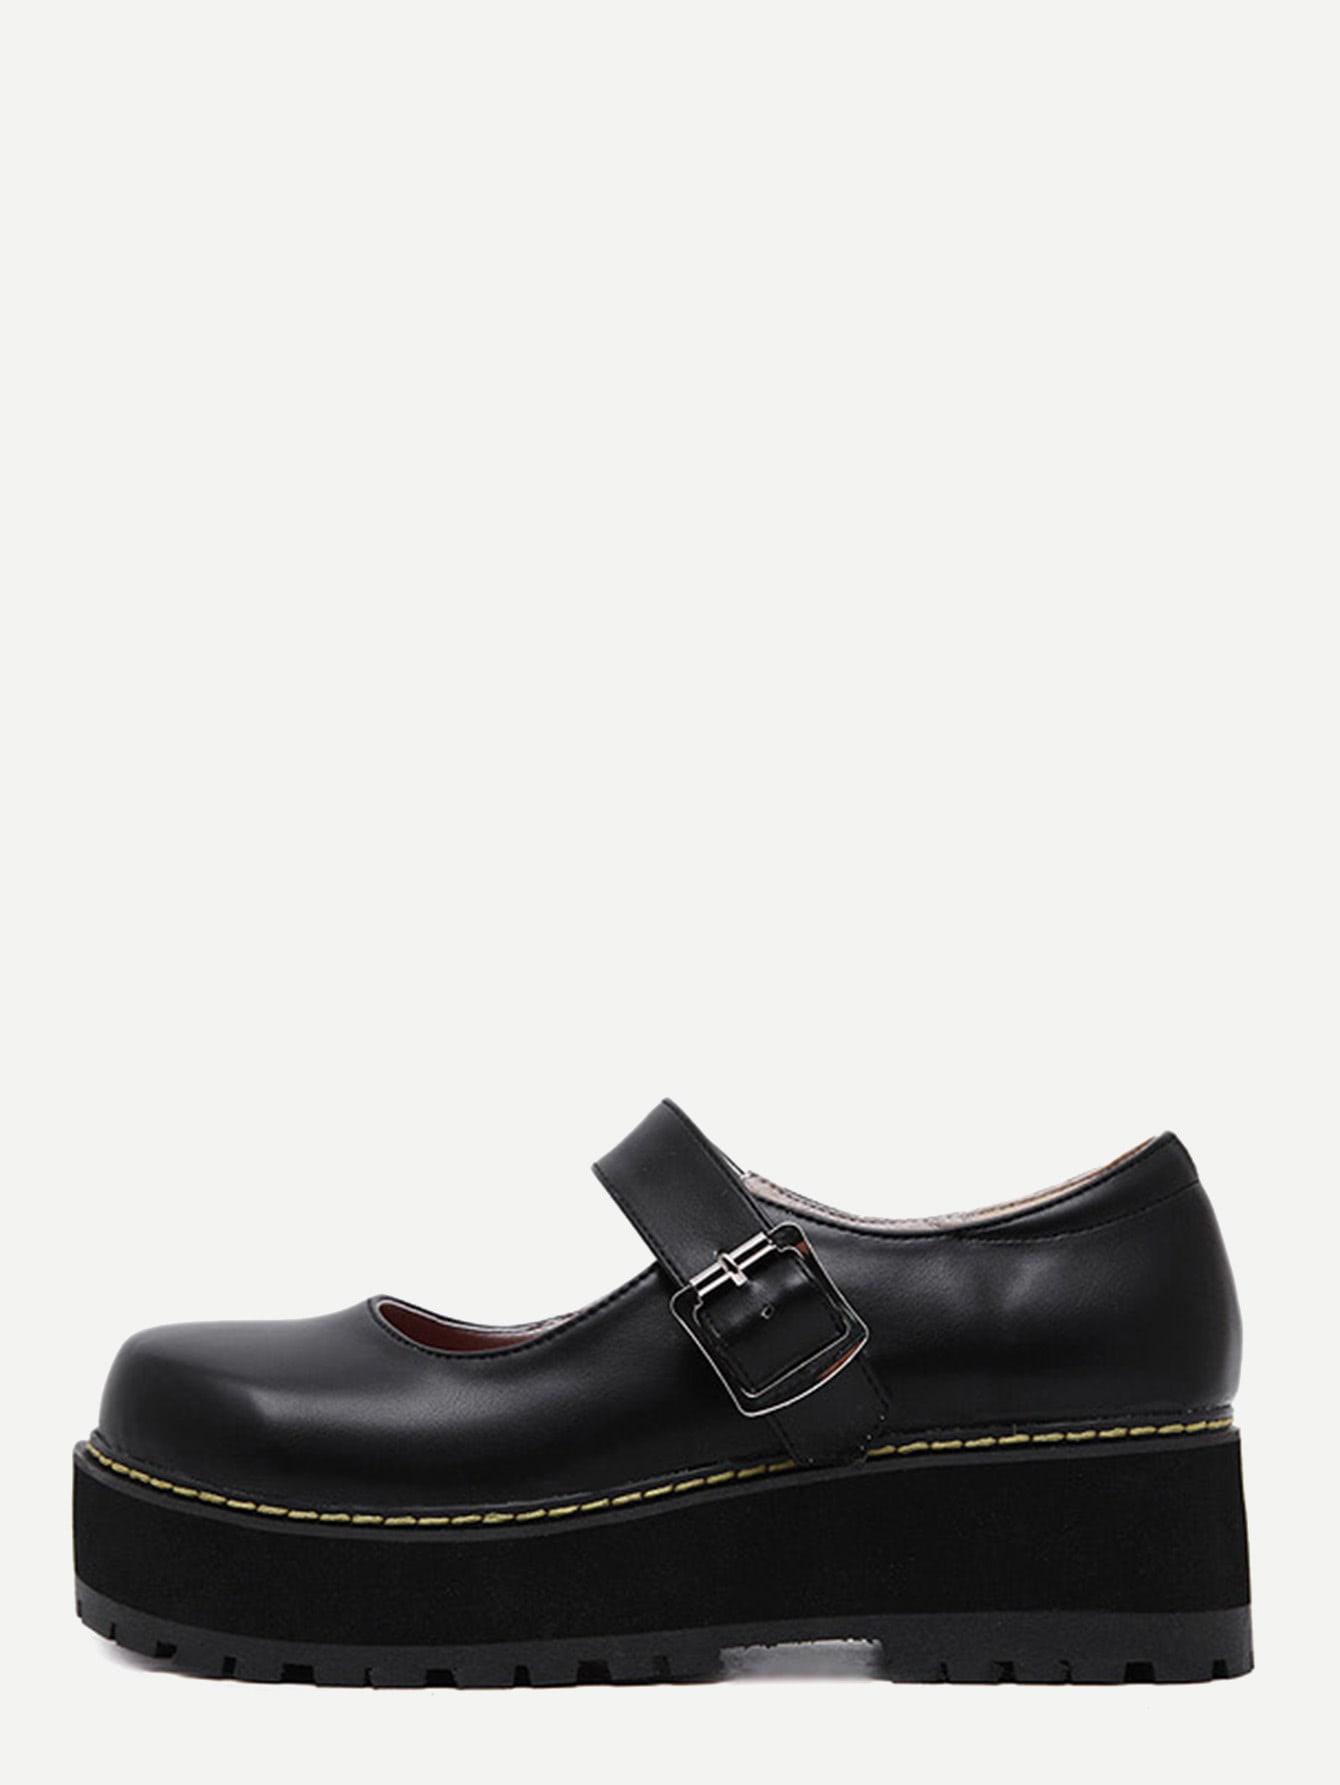 Фото Black Faux Leather Mary Jane Shoes. Купить с доставкой